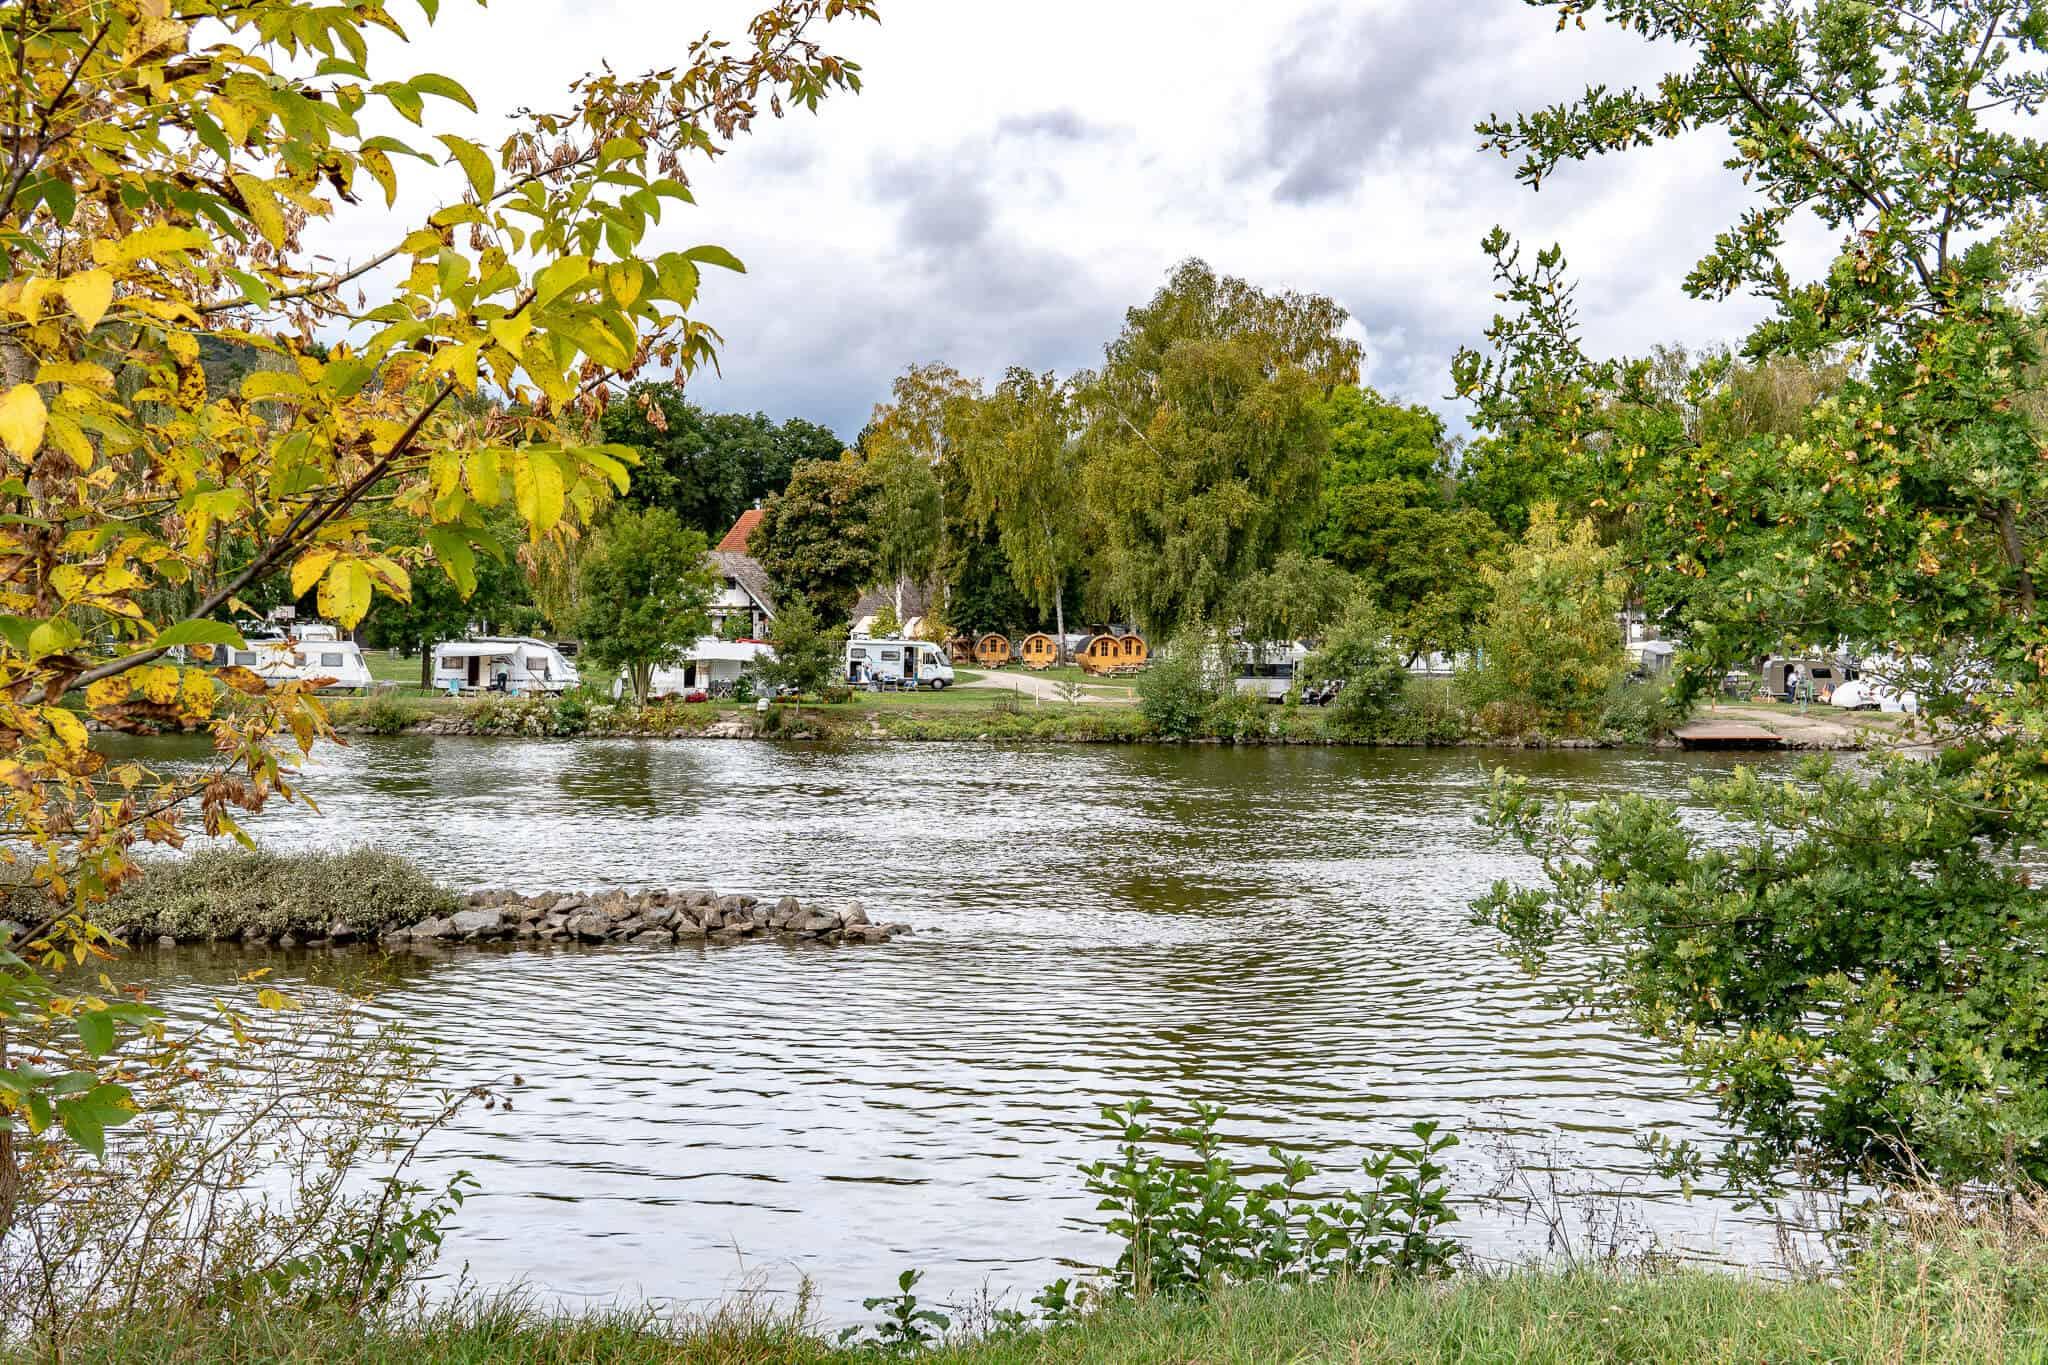 AZUR Campingplatz